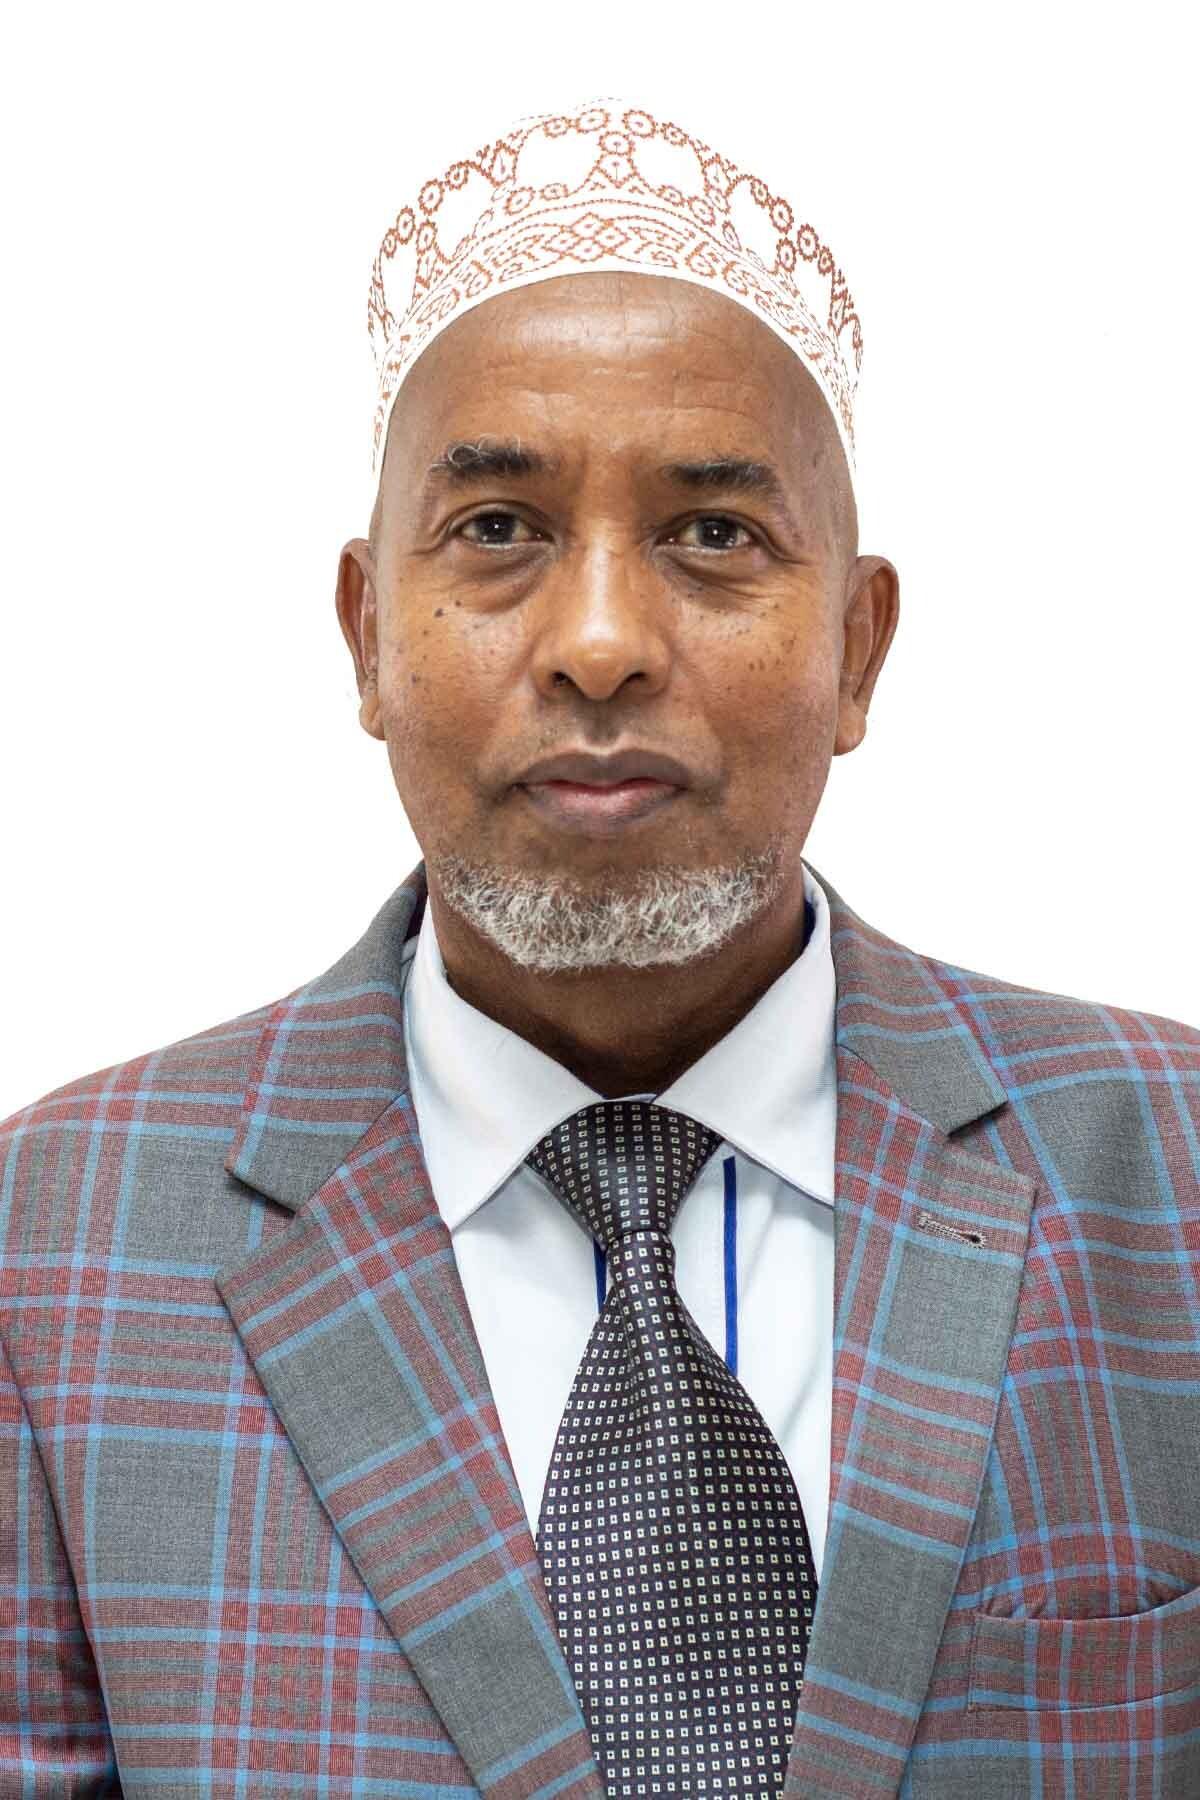 Mr.-Hussein-Abdi-Farah